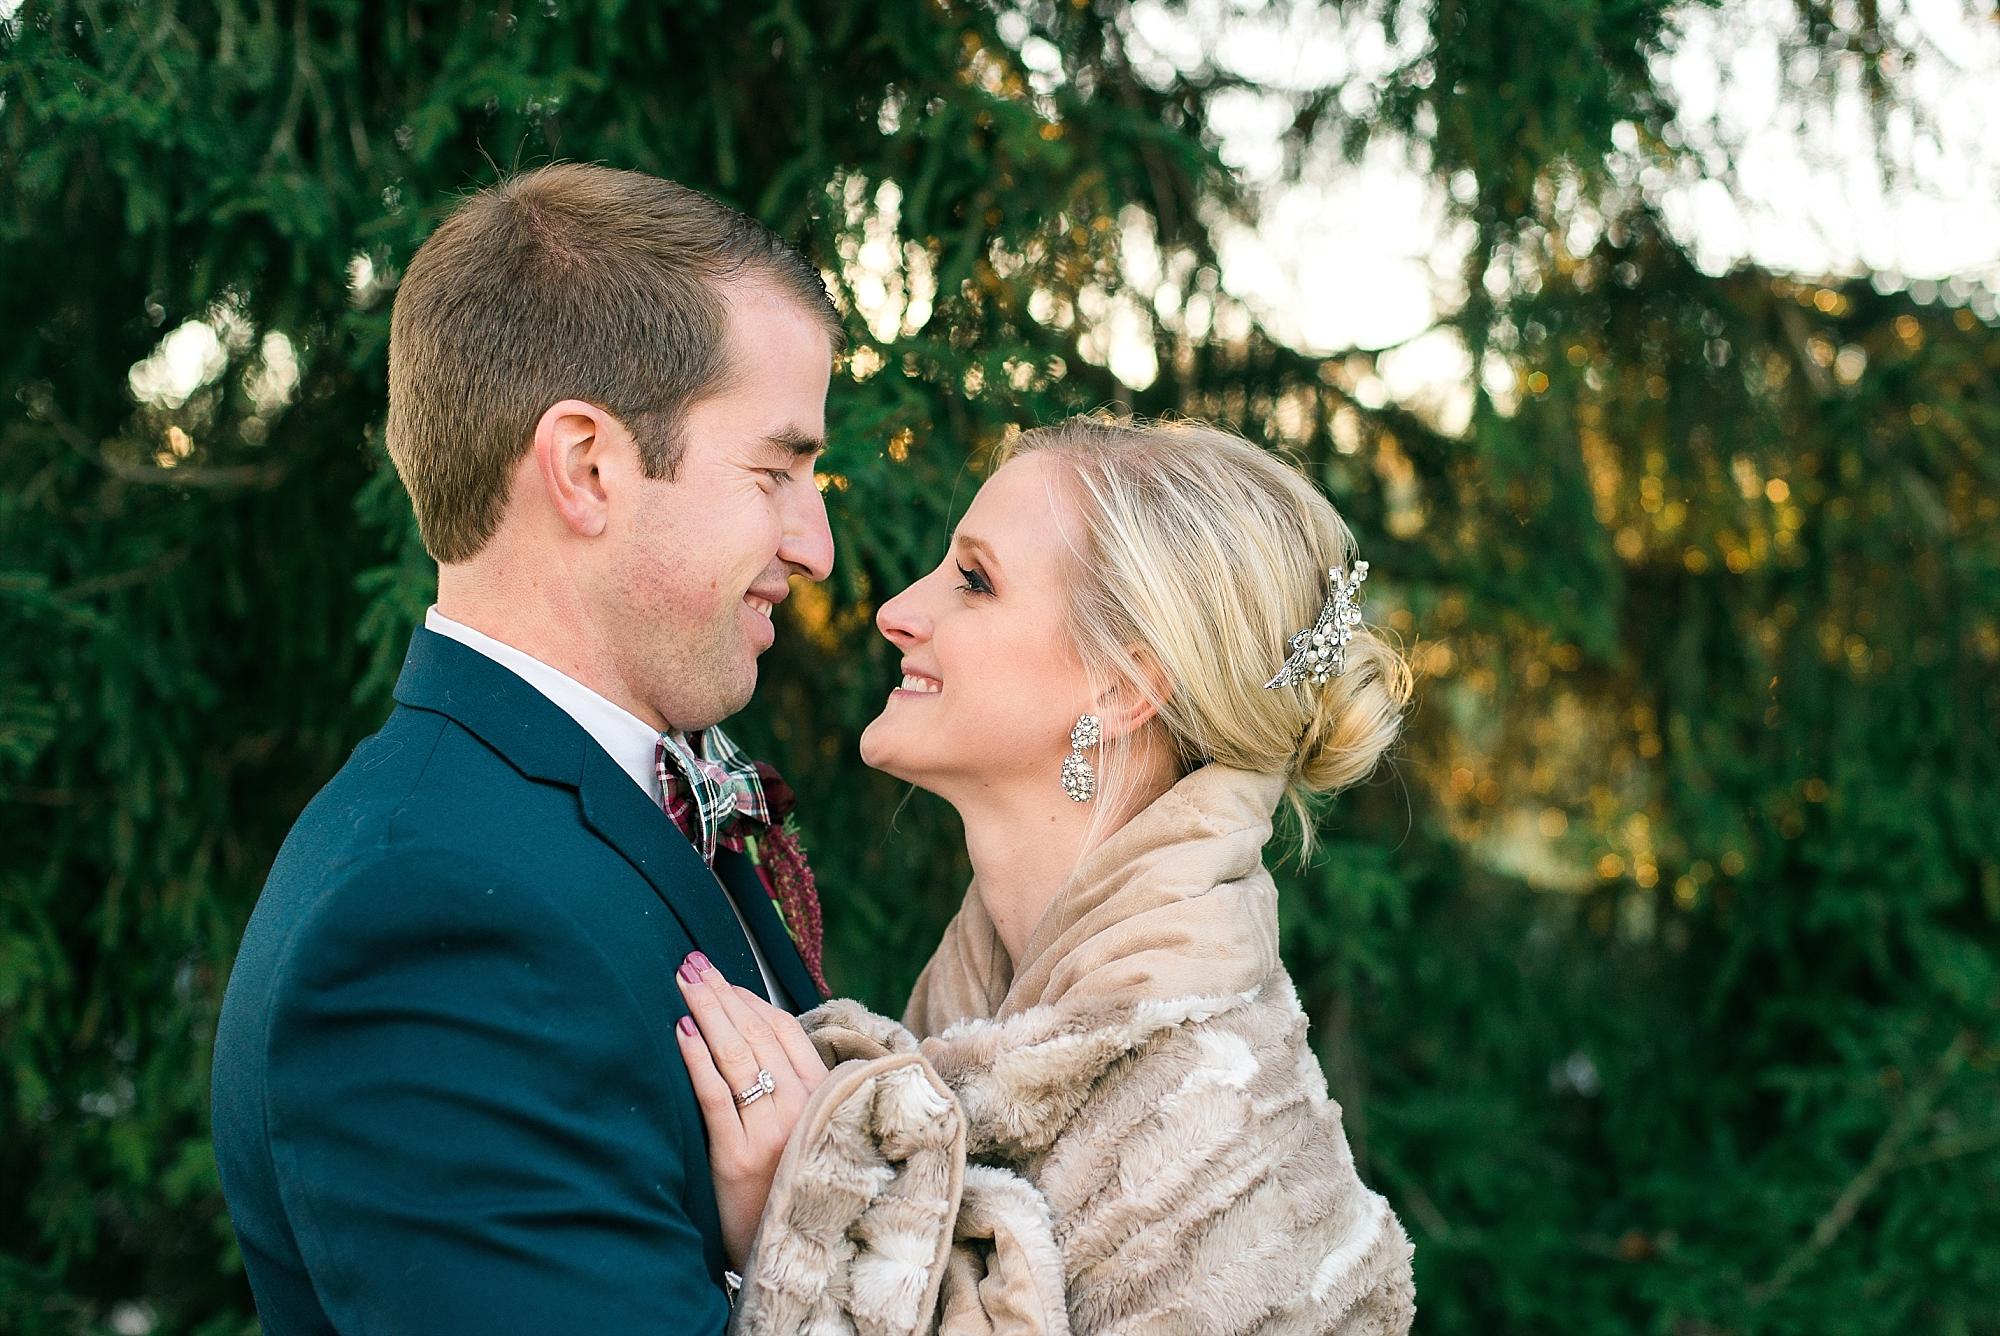 winter-weddings-are-beautiful